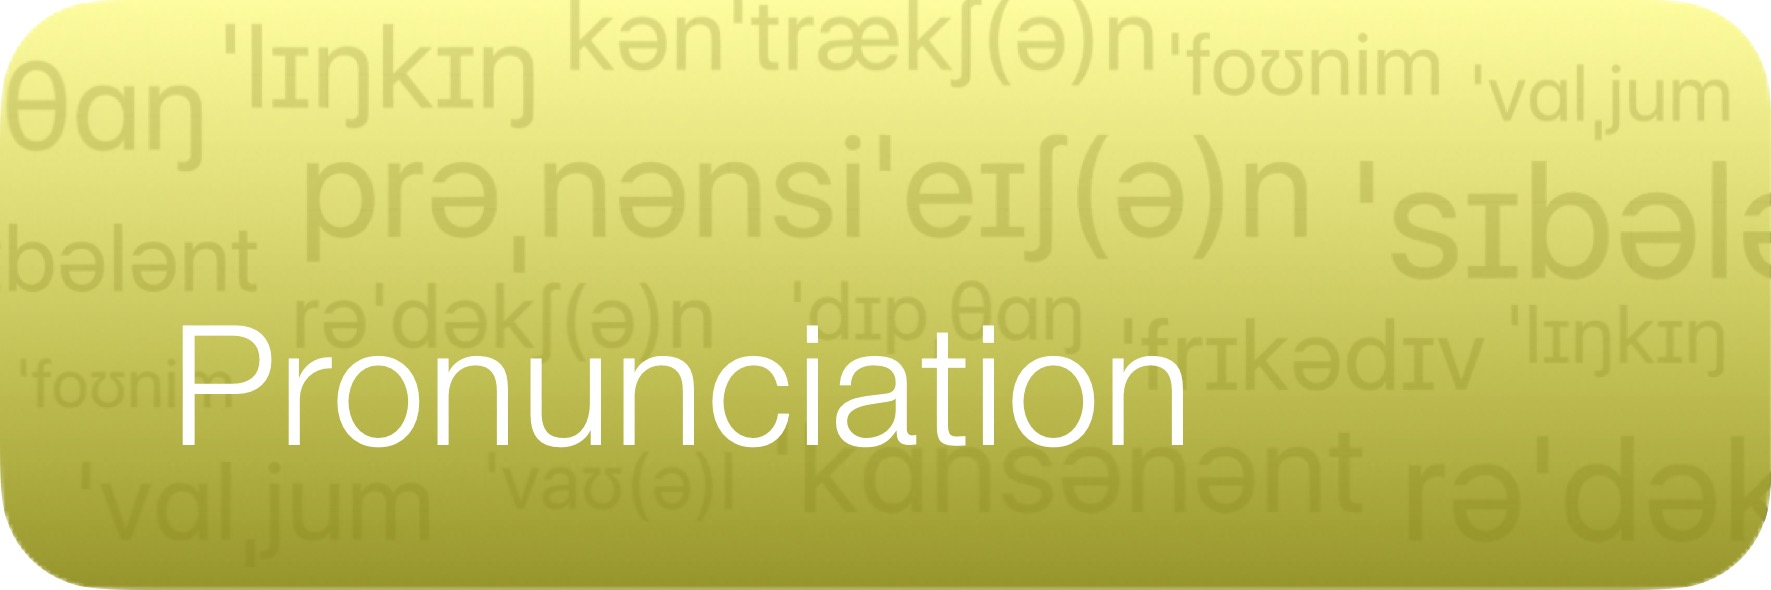 Study Button - Pronunciation Yellow